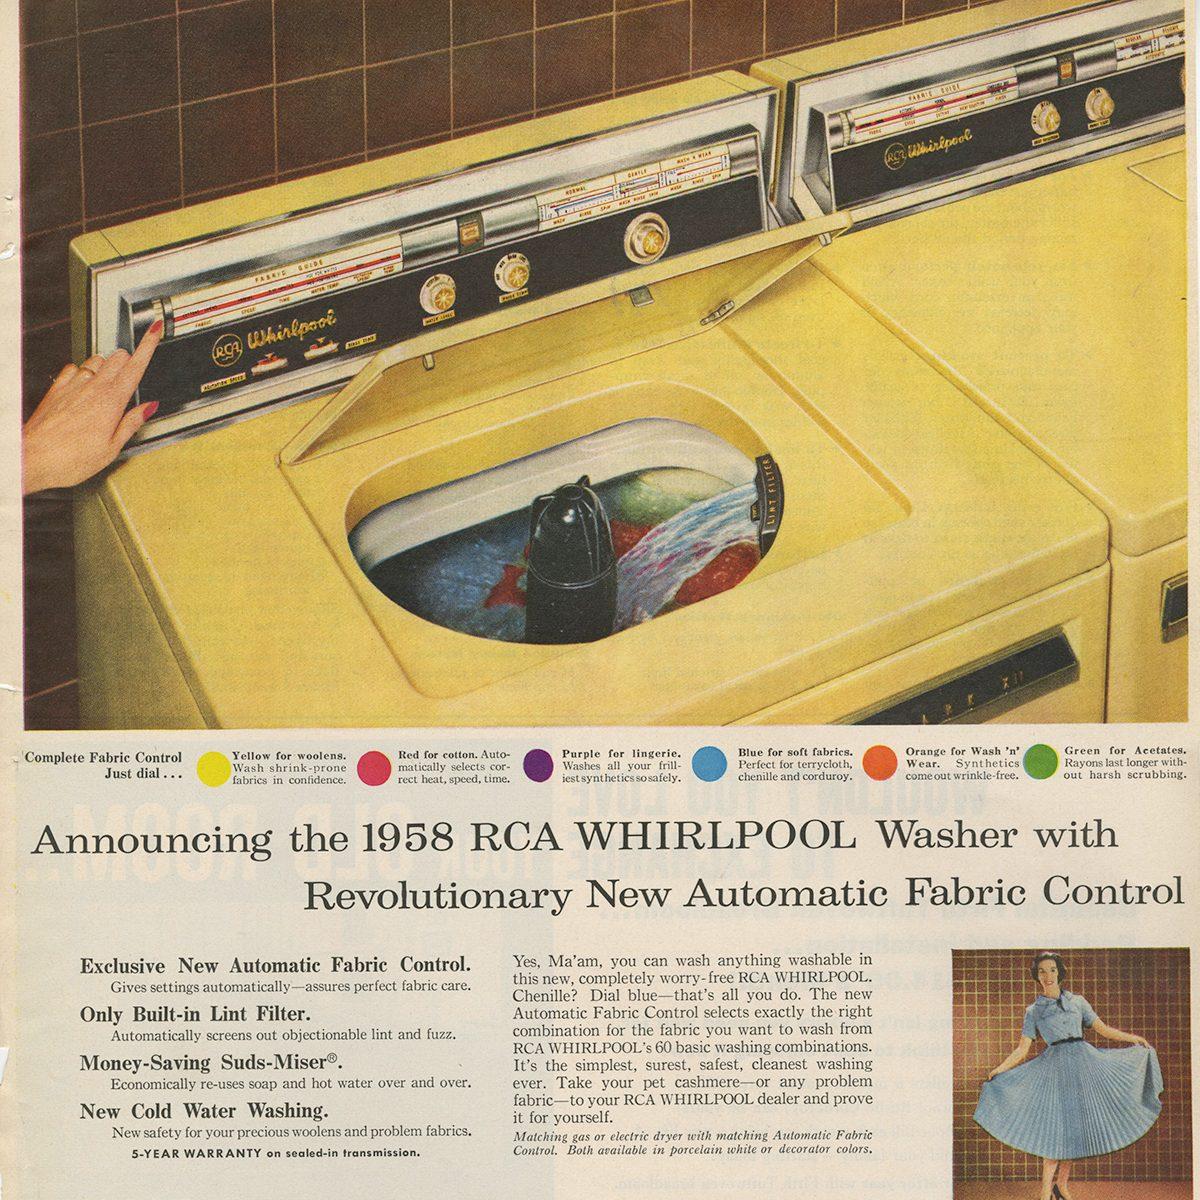 RCA Whirlpool Washer ad